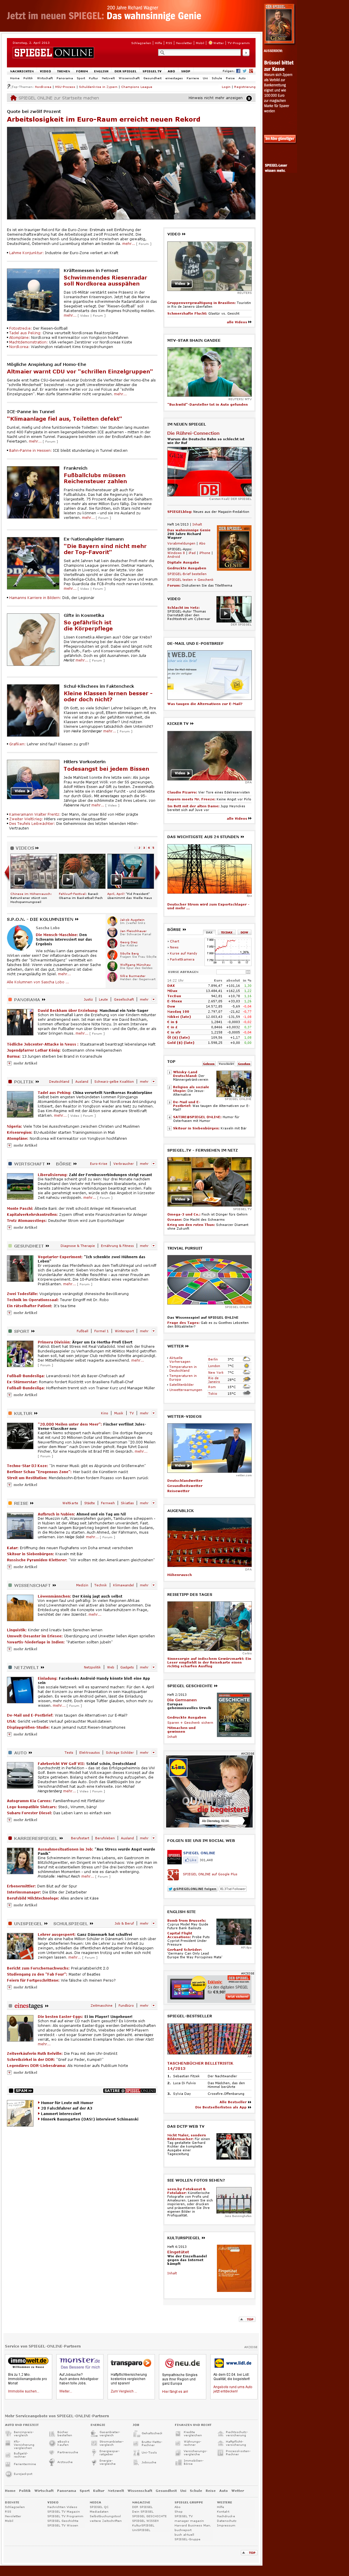 Spiegel Online at Tuesday April 2, 2013, 12:23 p.m. UTC